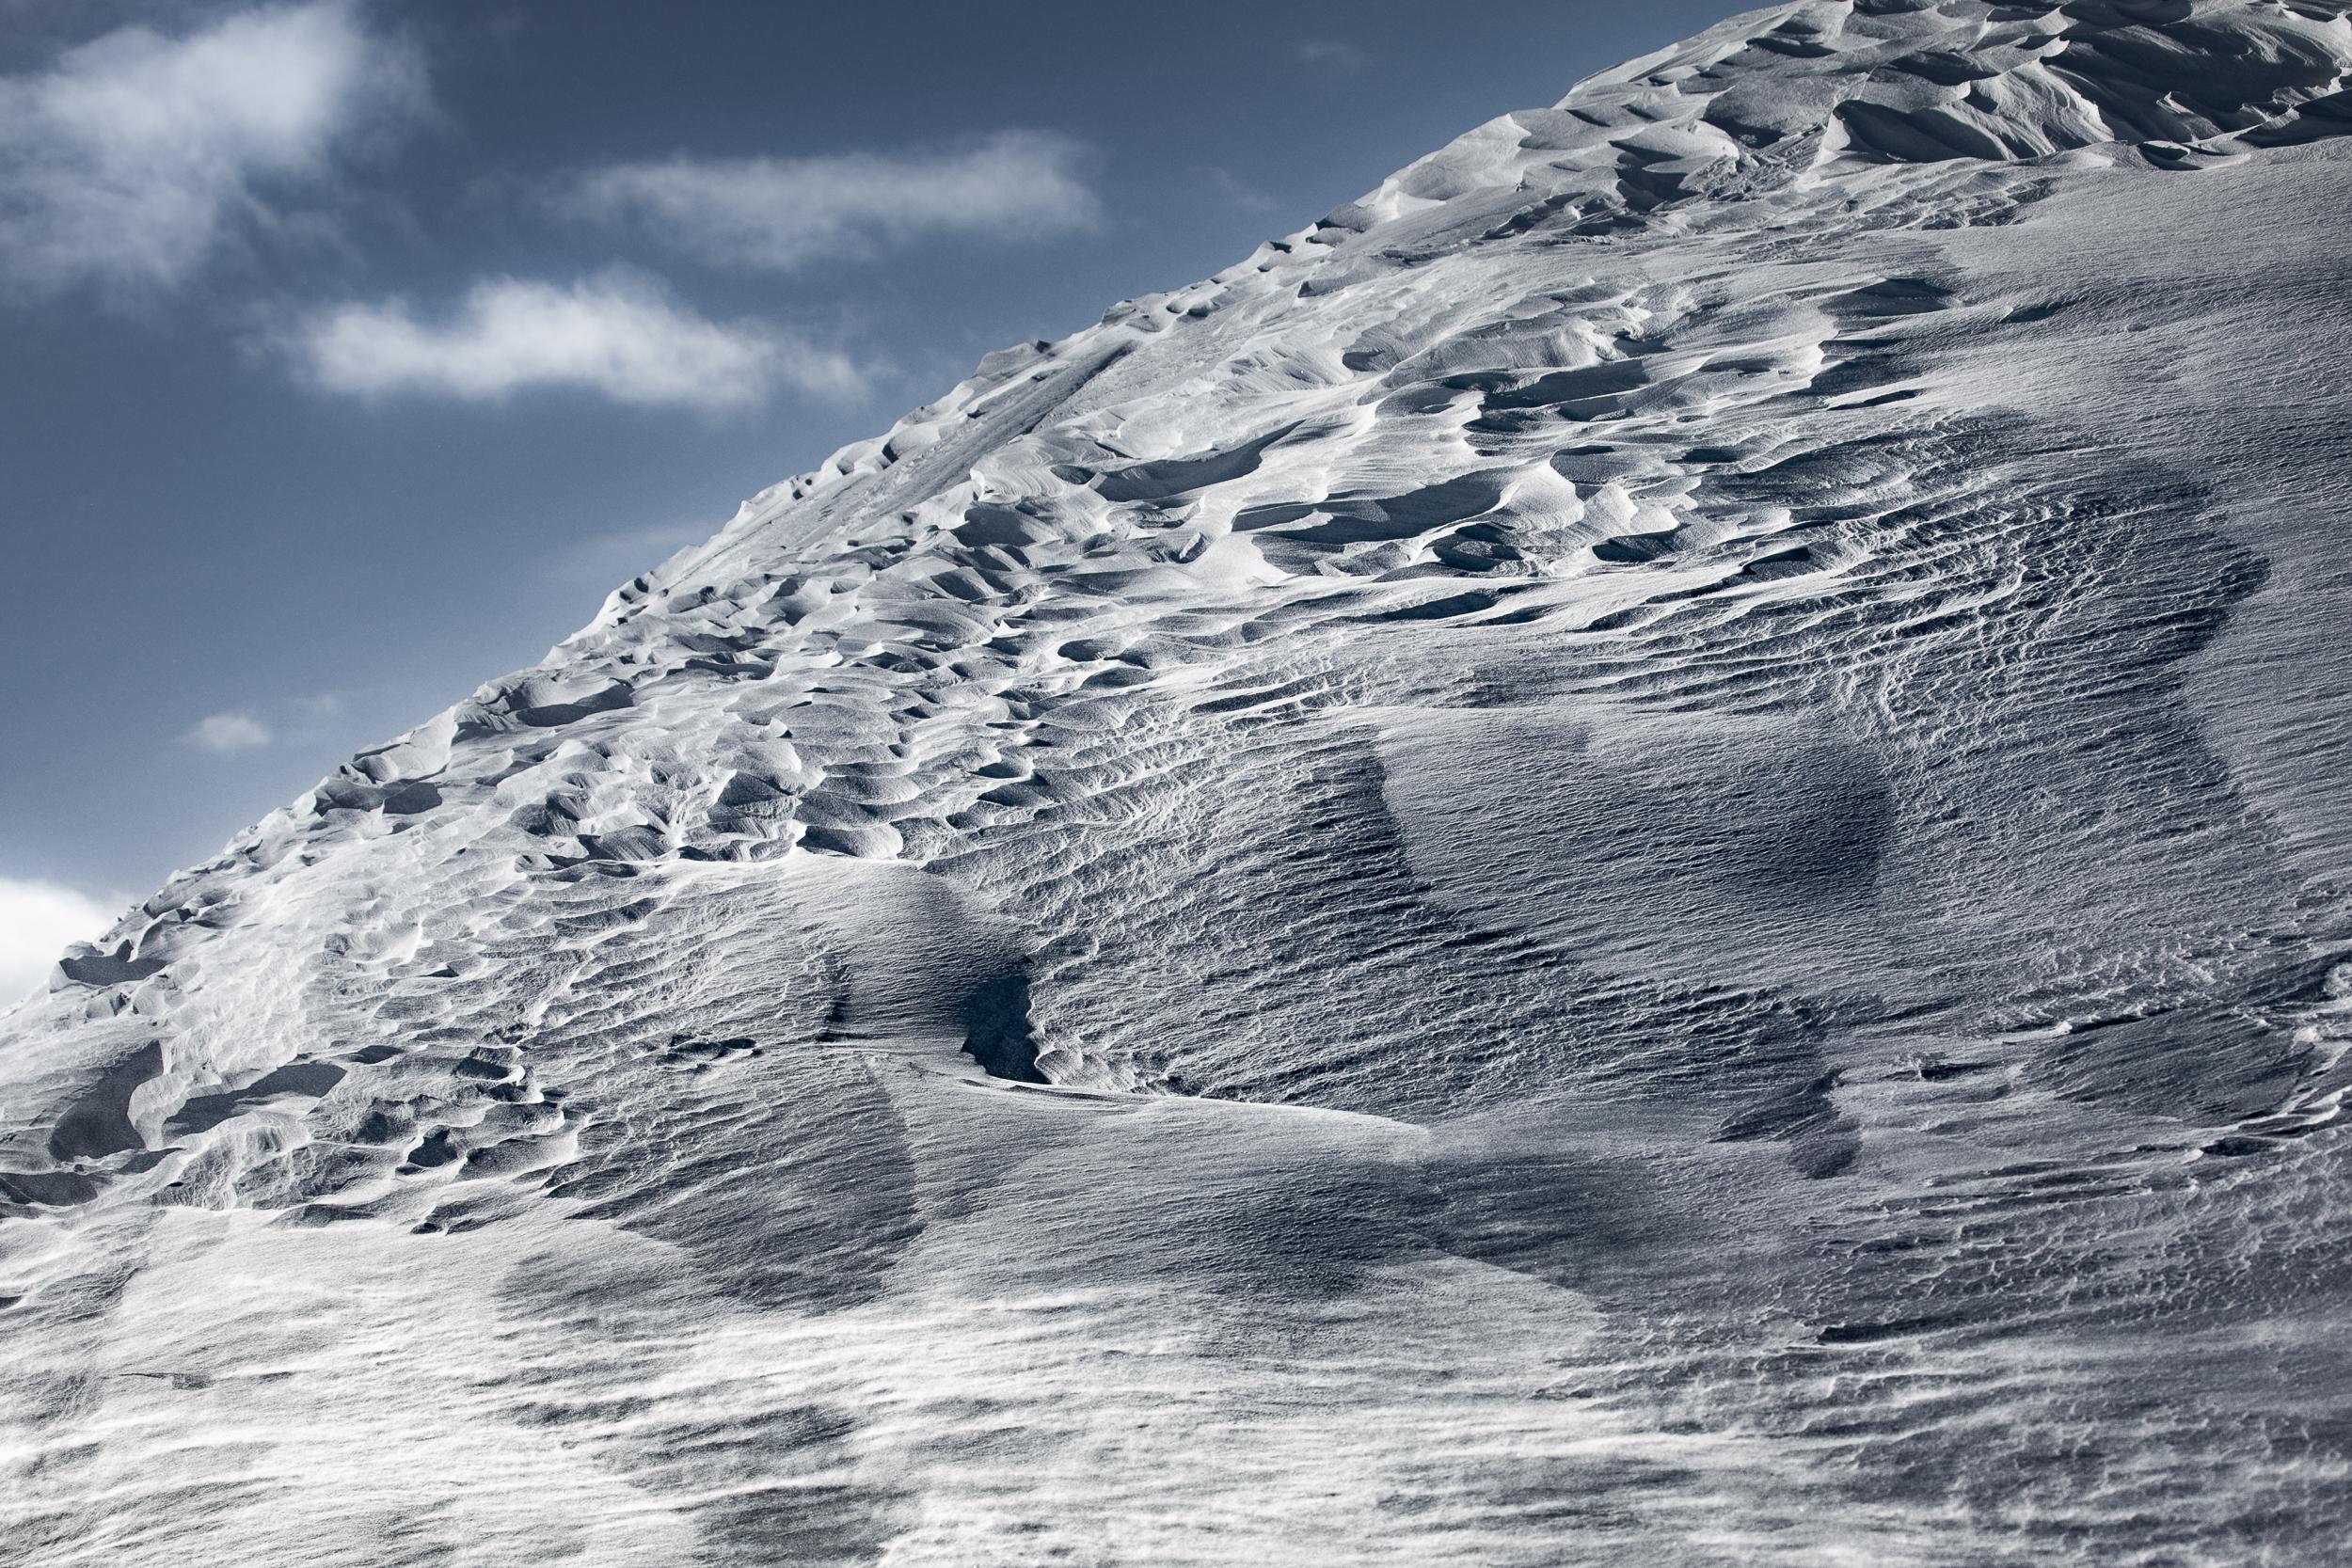 image_reviews_mountain.jpg